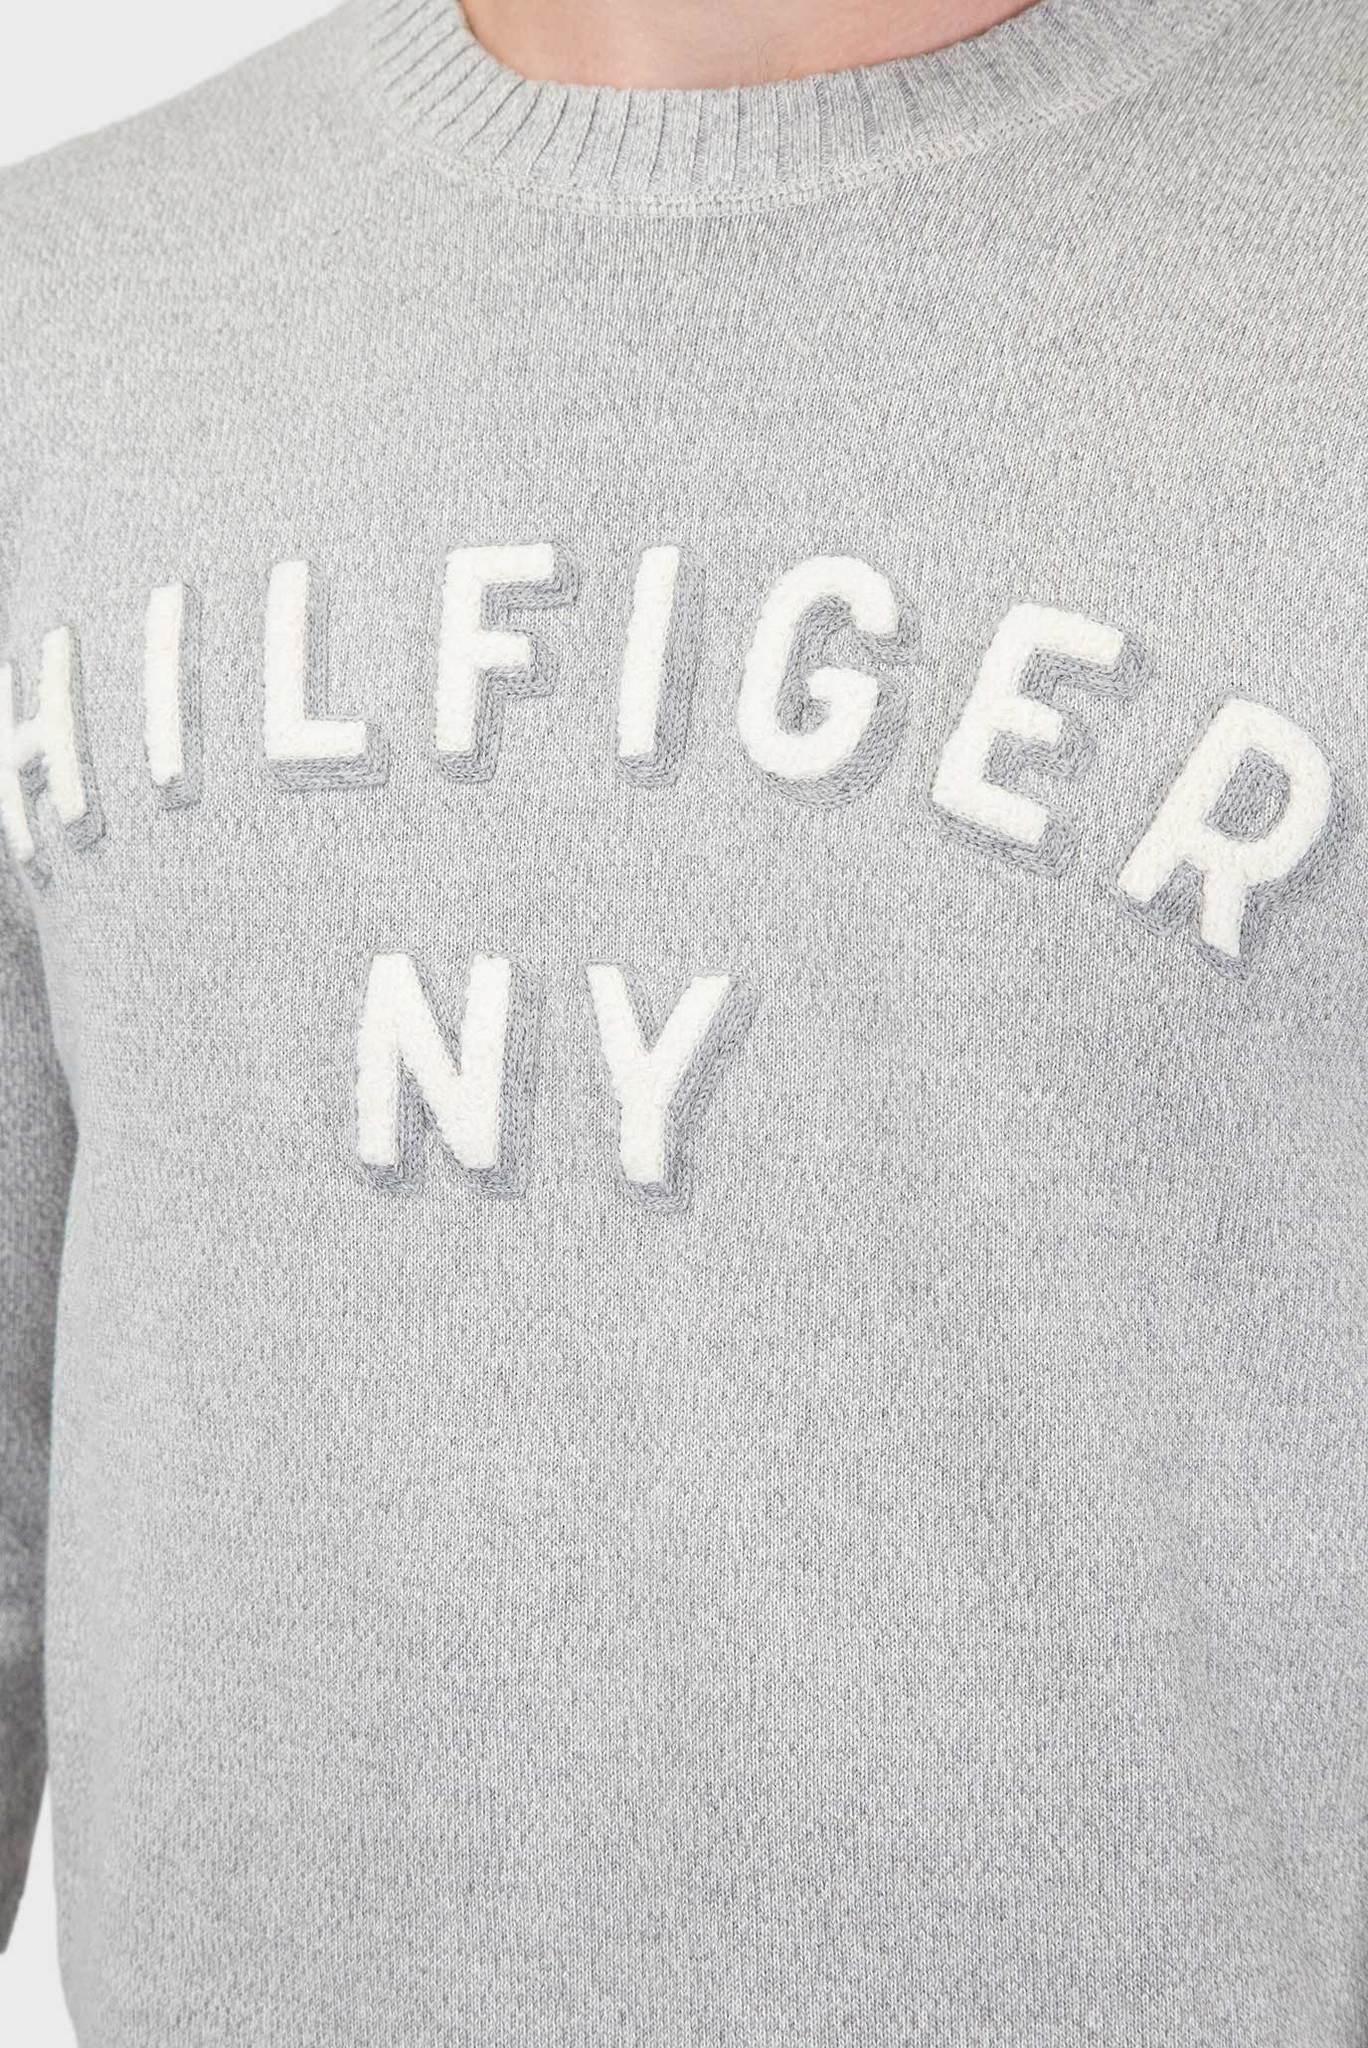 Мужской серый джемпер Tommy Hilfiger